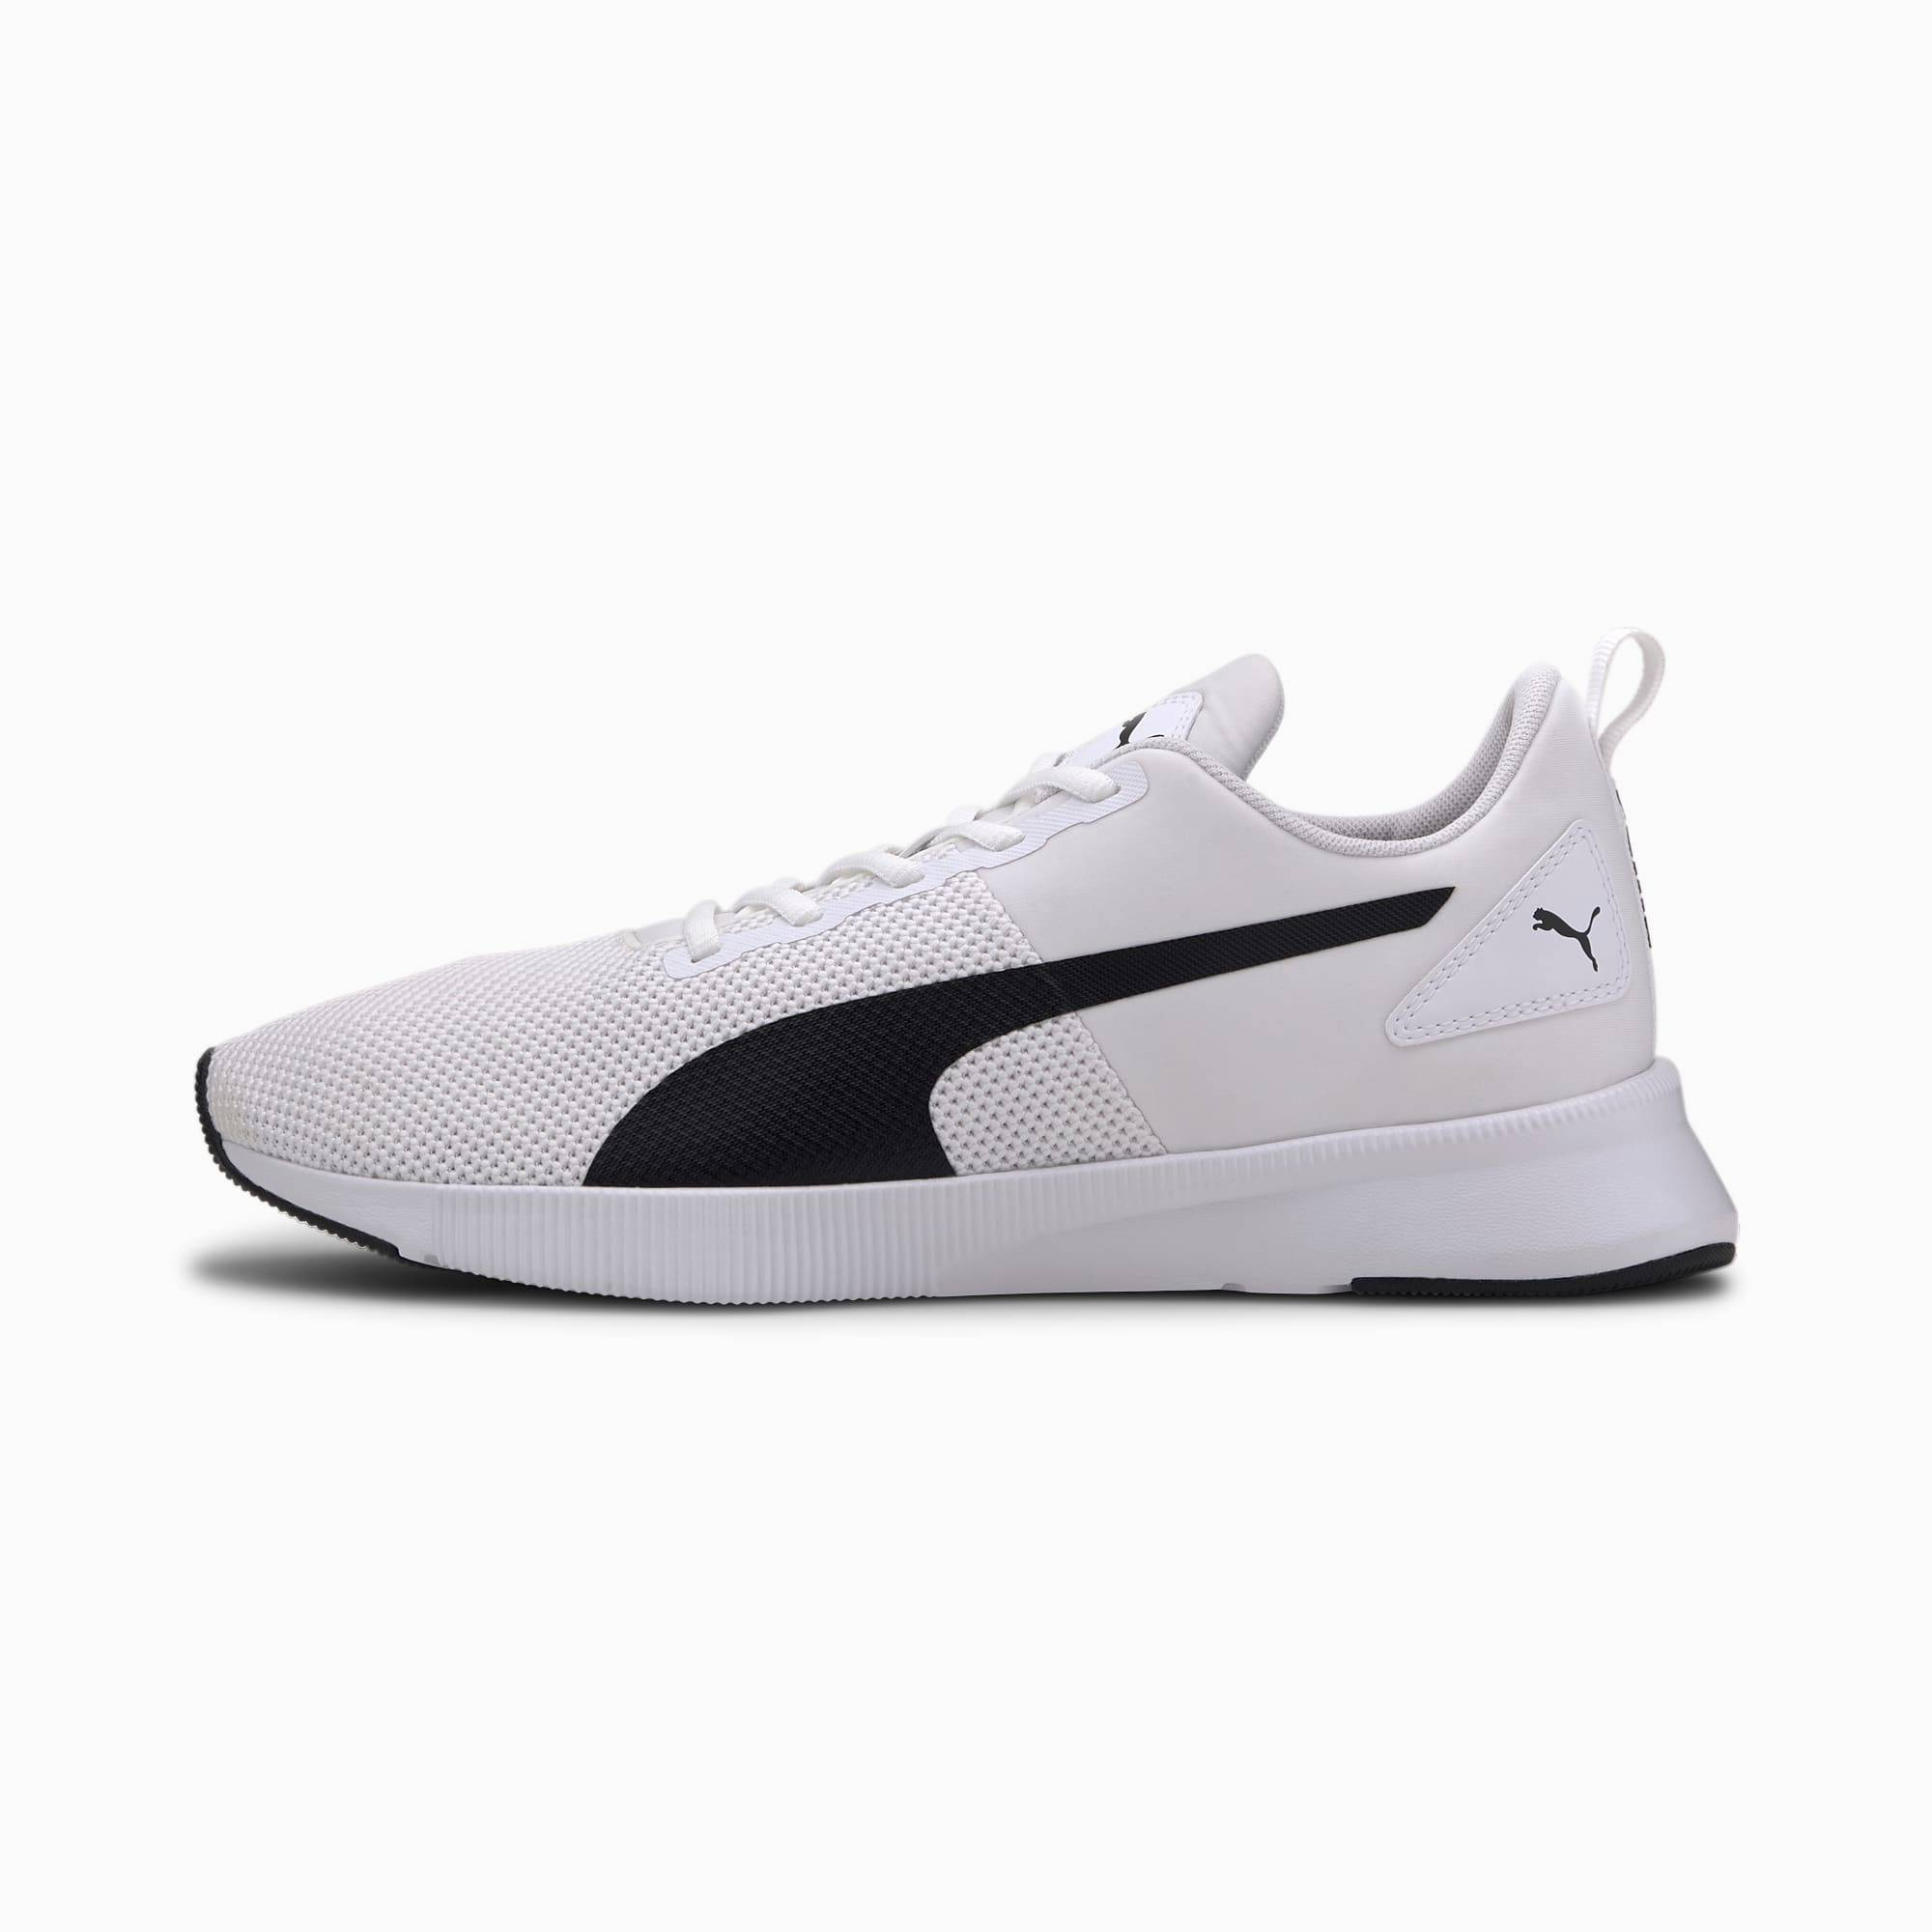 PUMA Chaussure de course Flyer Runner, Blanc/Noir, Taille 43, Chaussures